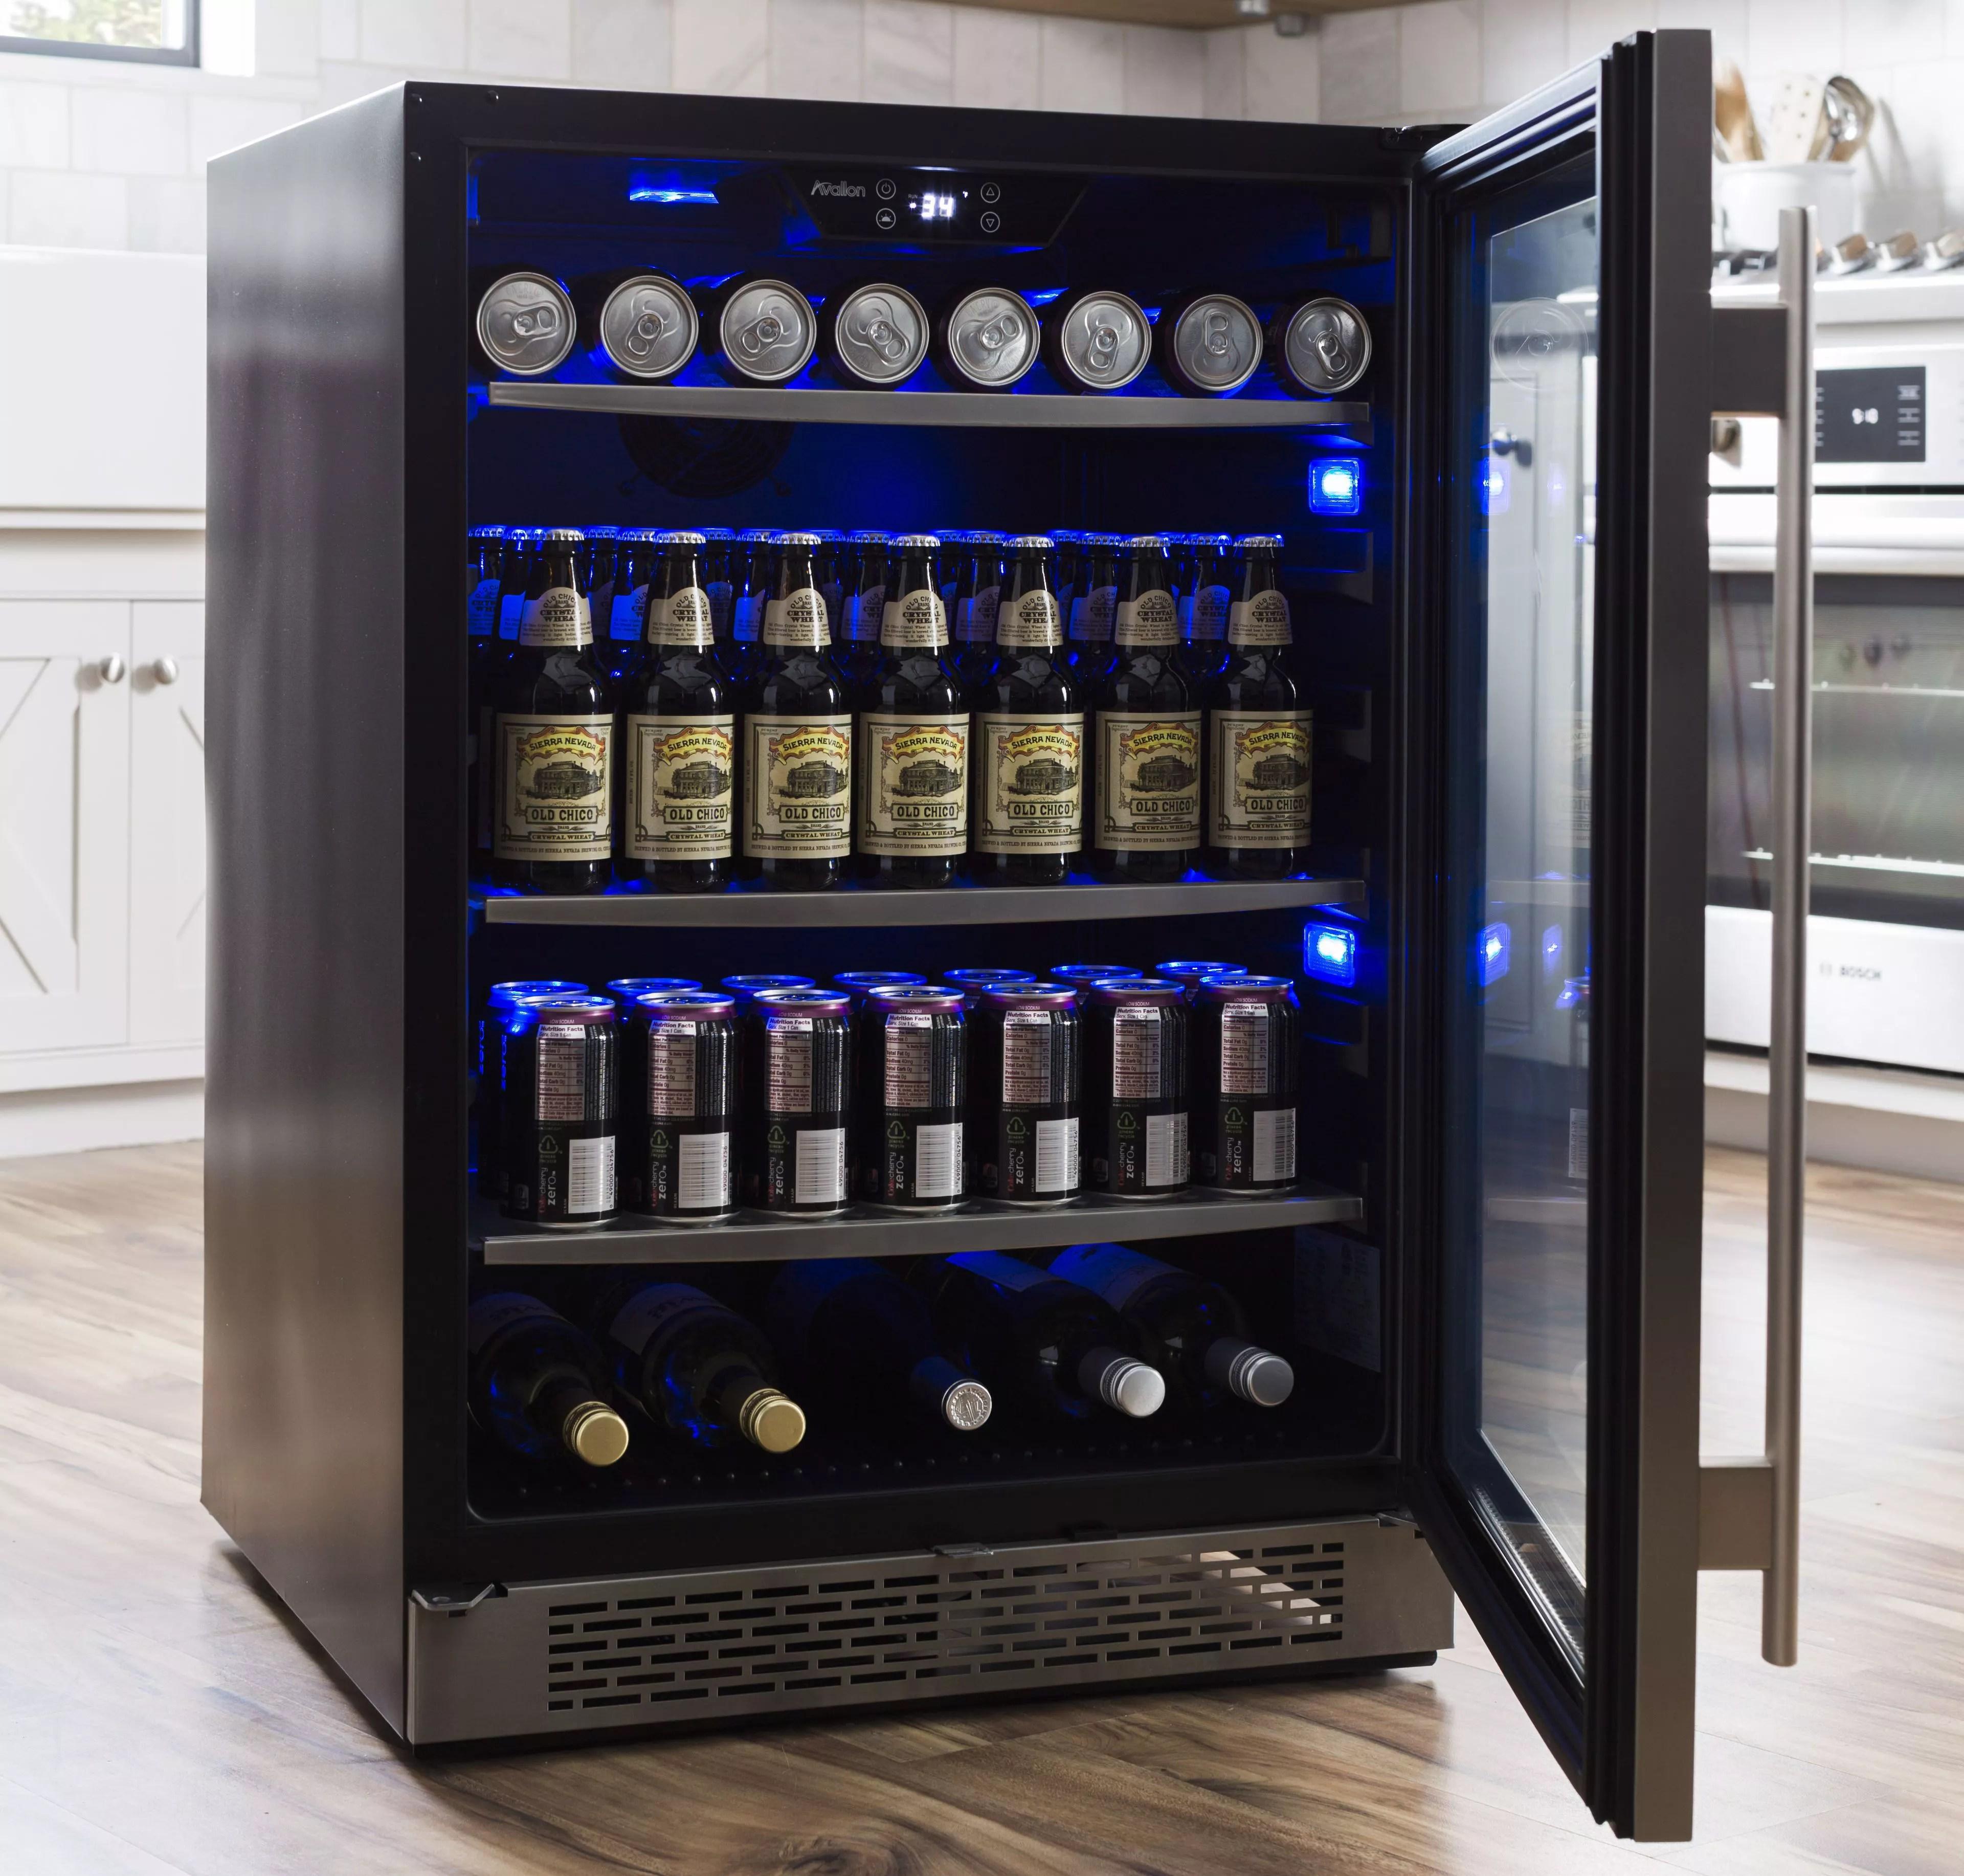 complete outdoor kitchen kits front 5th wheel kegerators, beer coolers, kegs & dispensers :: kegerator.com